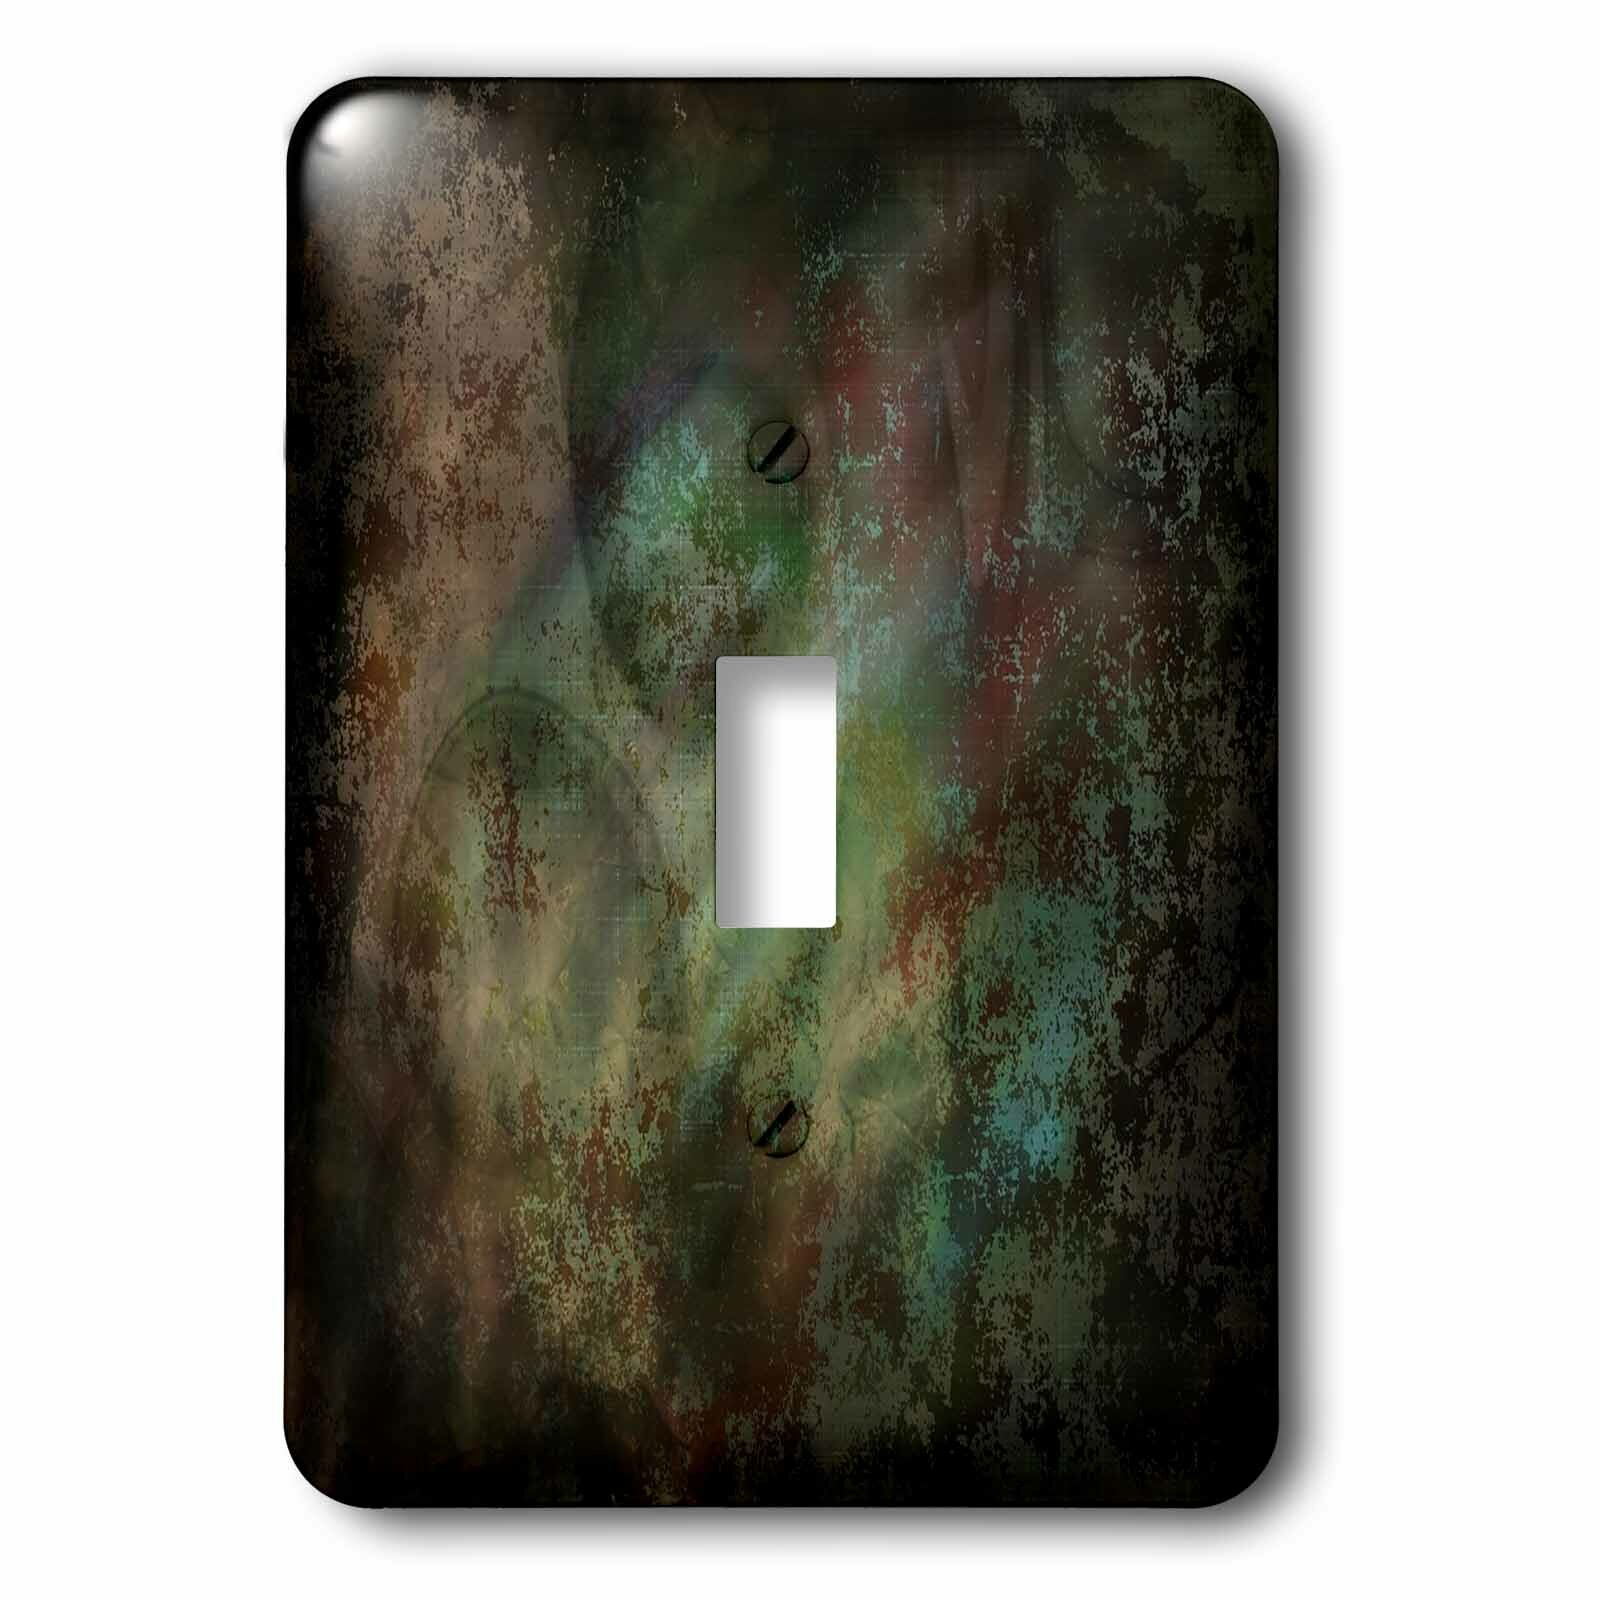 3drose Painted Grunge 1 Gang Toggle Light Switch Wall Plate Wayfair